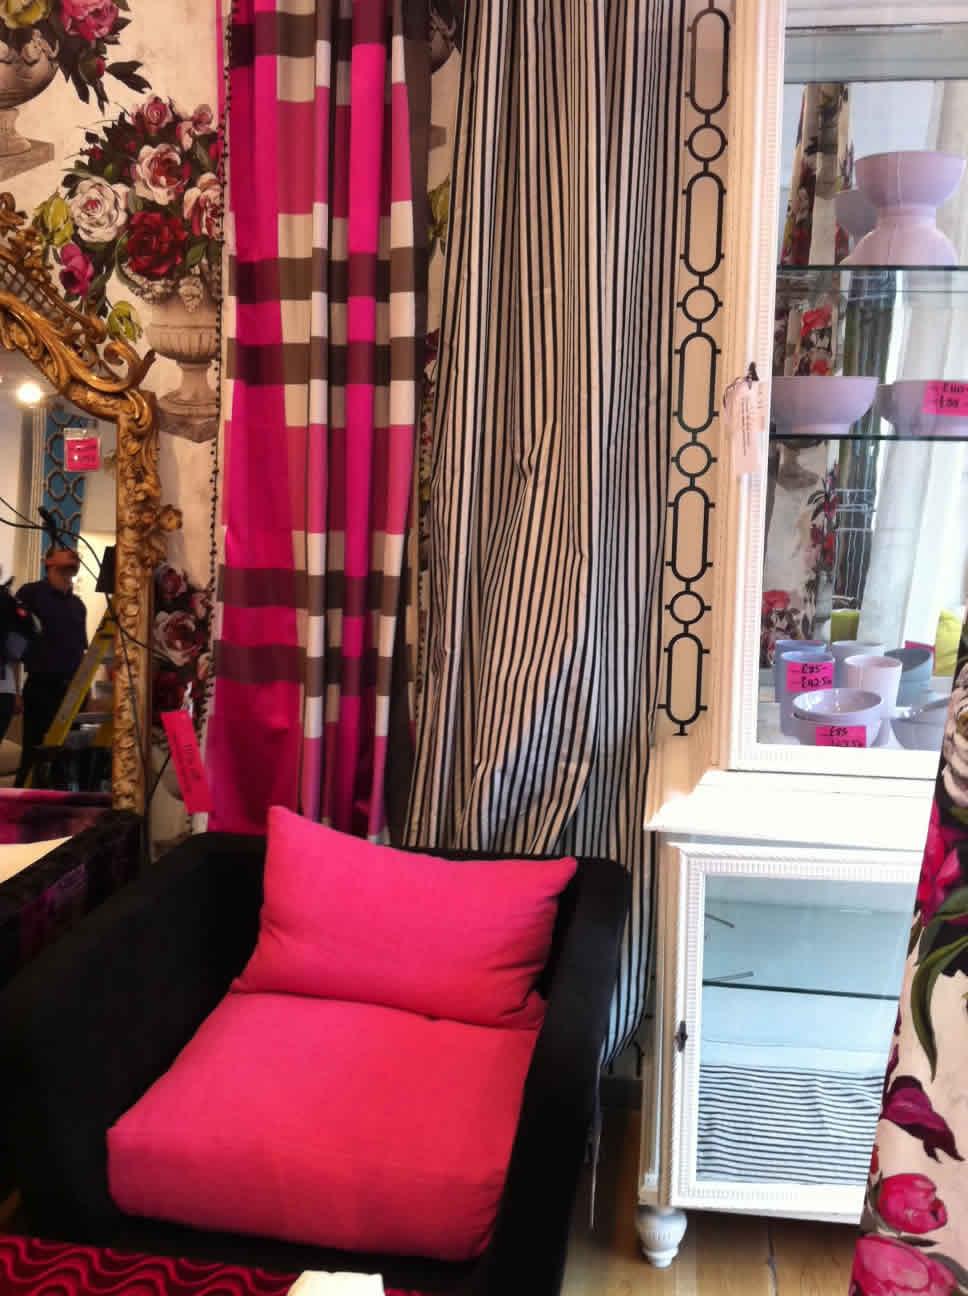 back-and-pink-interior-design